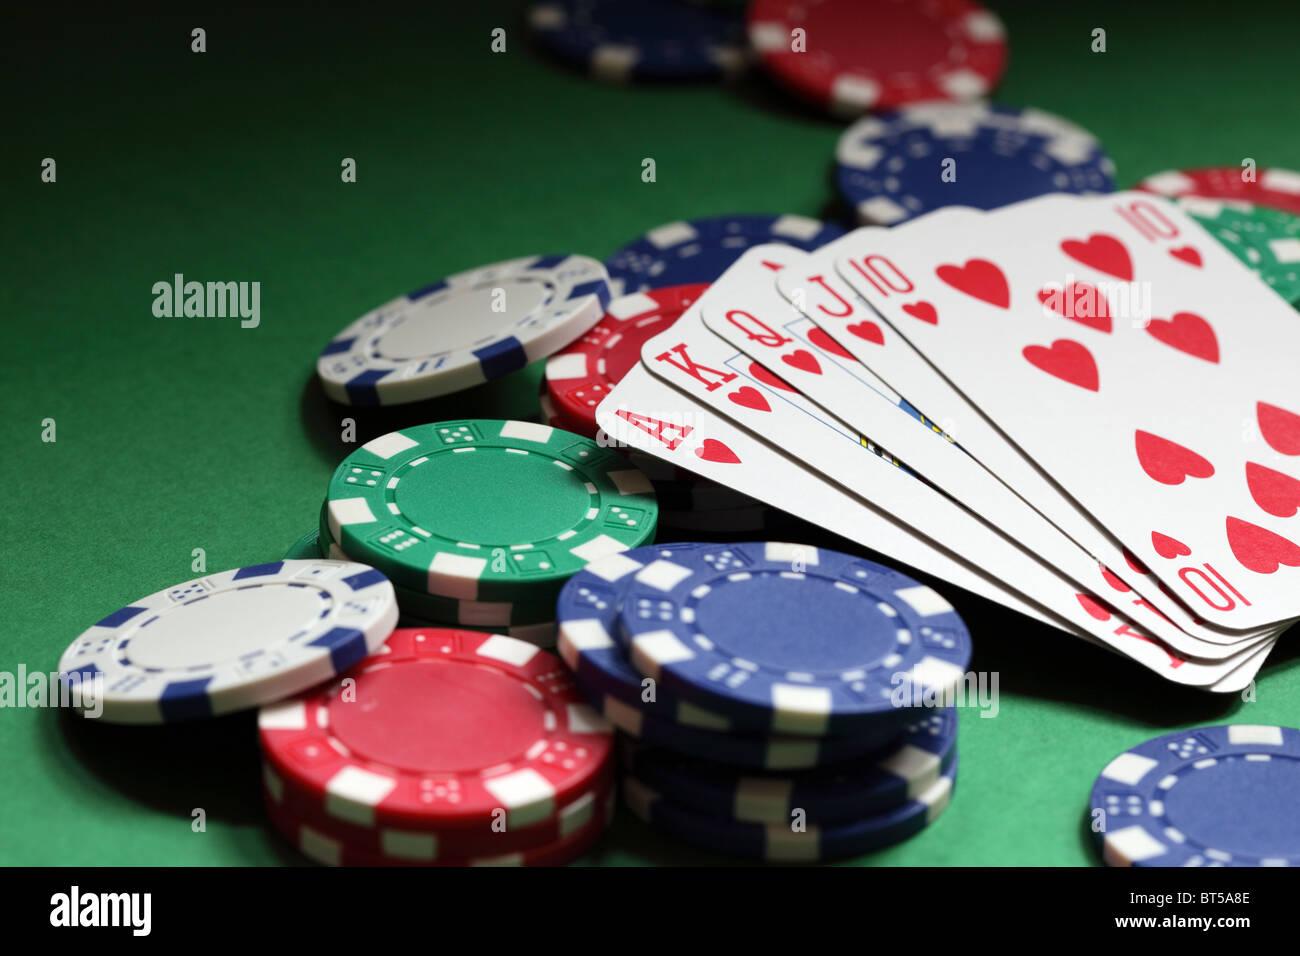 Mano de Poker escalera real Imagen De Stock